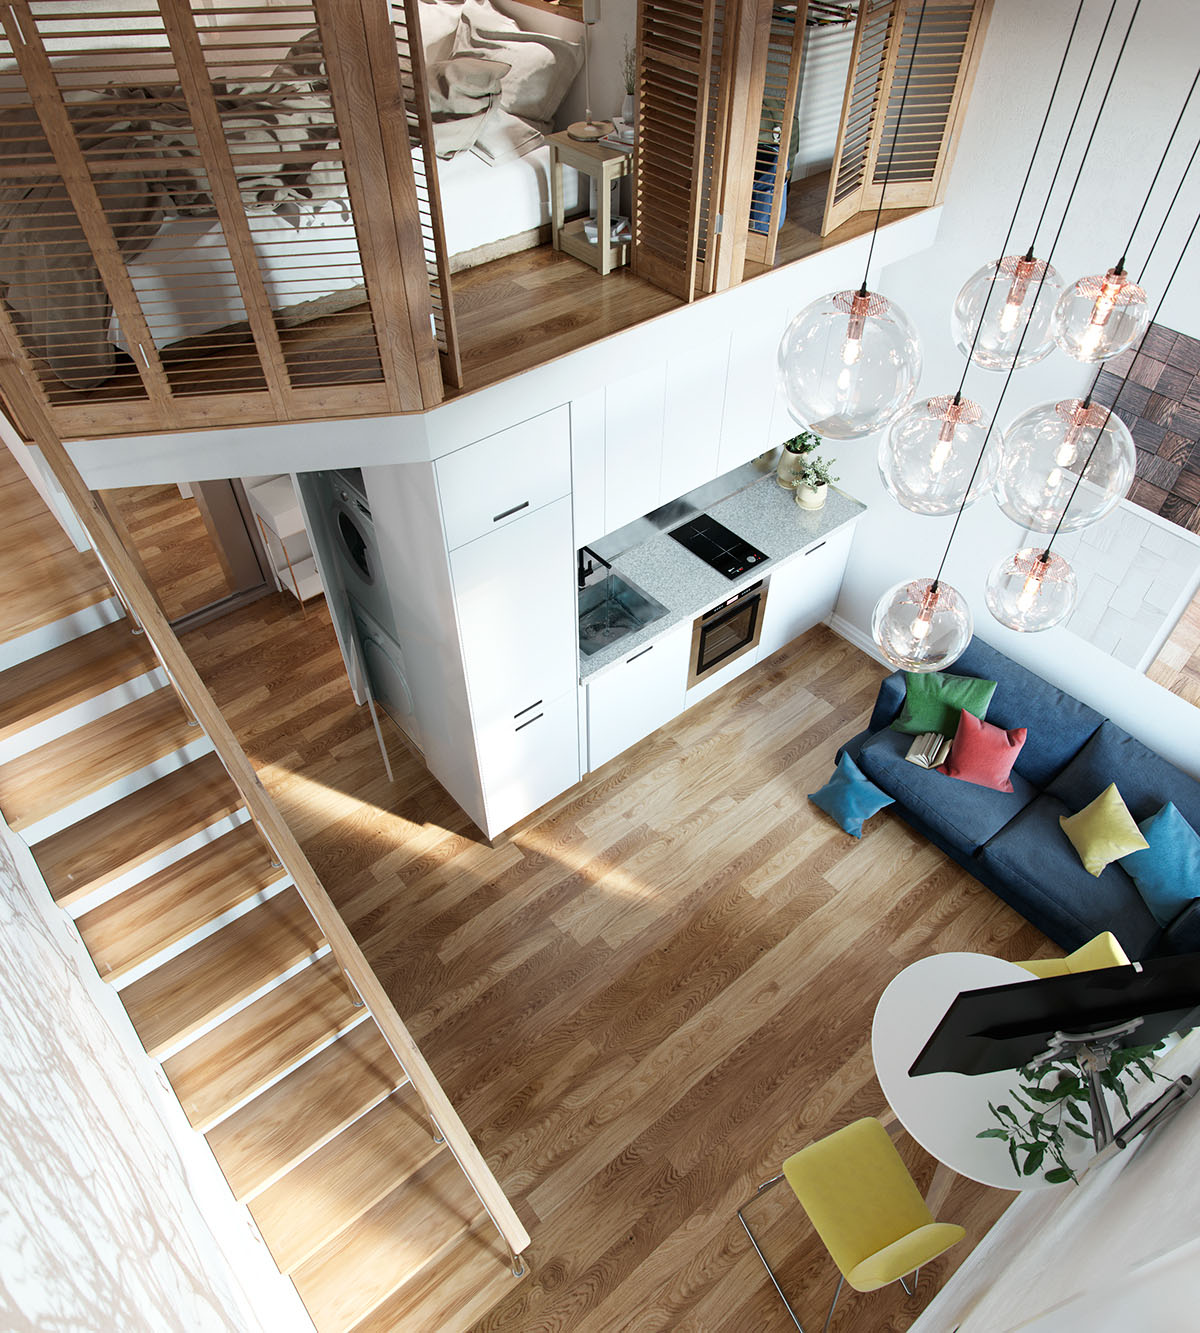 Small Studio Apartment In Moscow With Loft Bedroom  iDesignArch  Interior Design Architecture